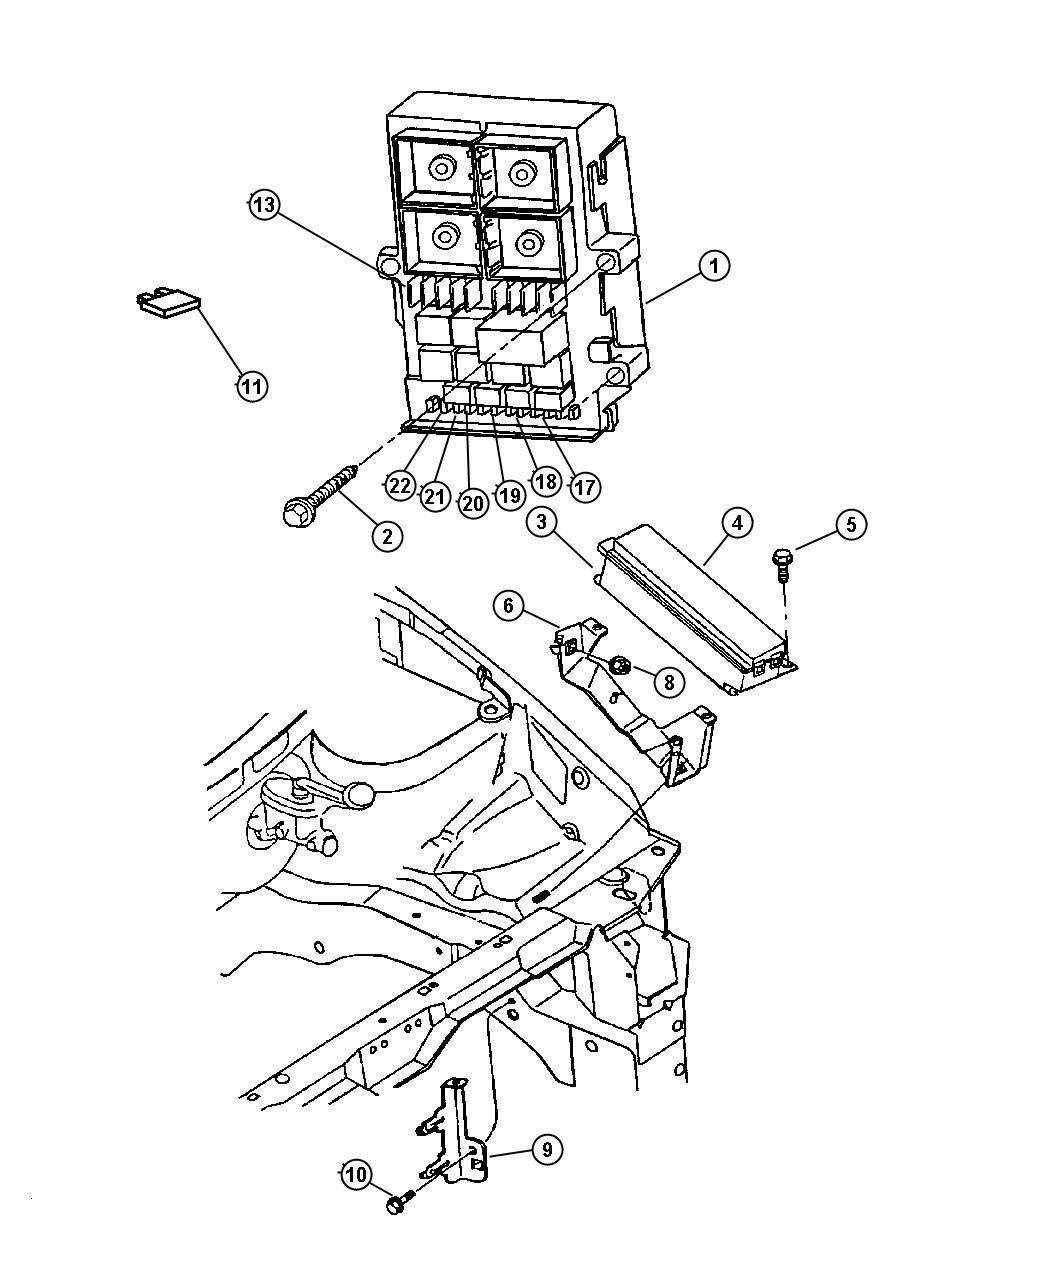 Fuse Box Diagram For Chrysler Concorde